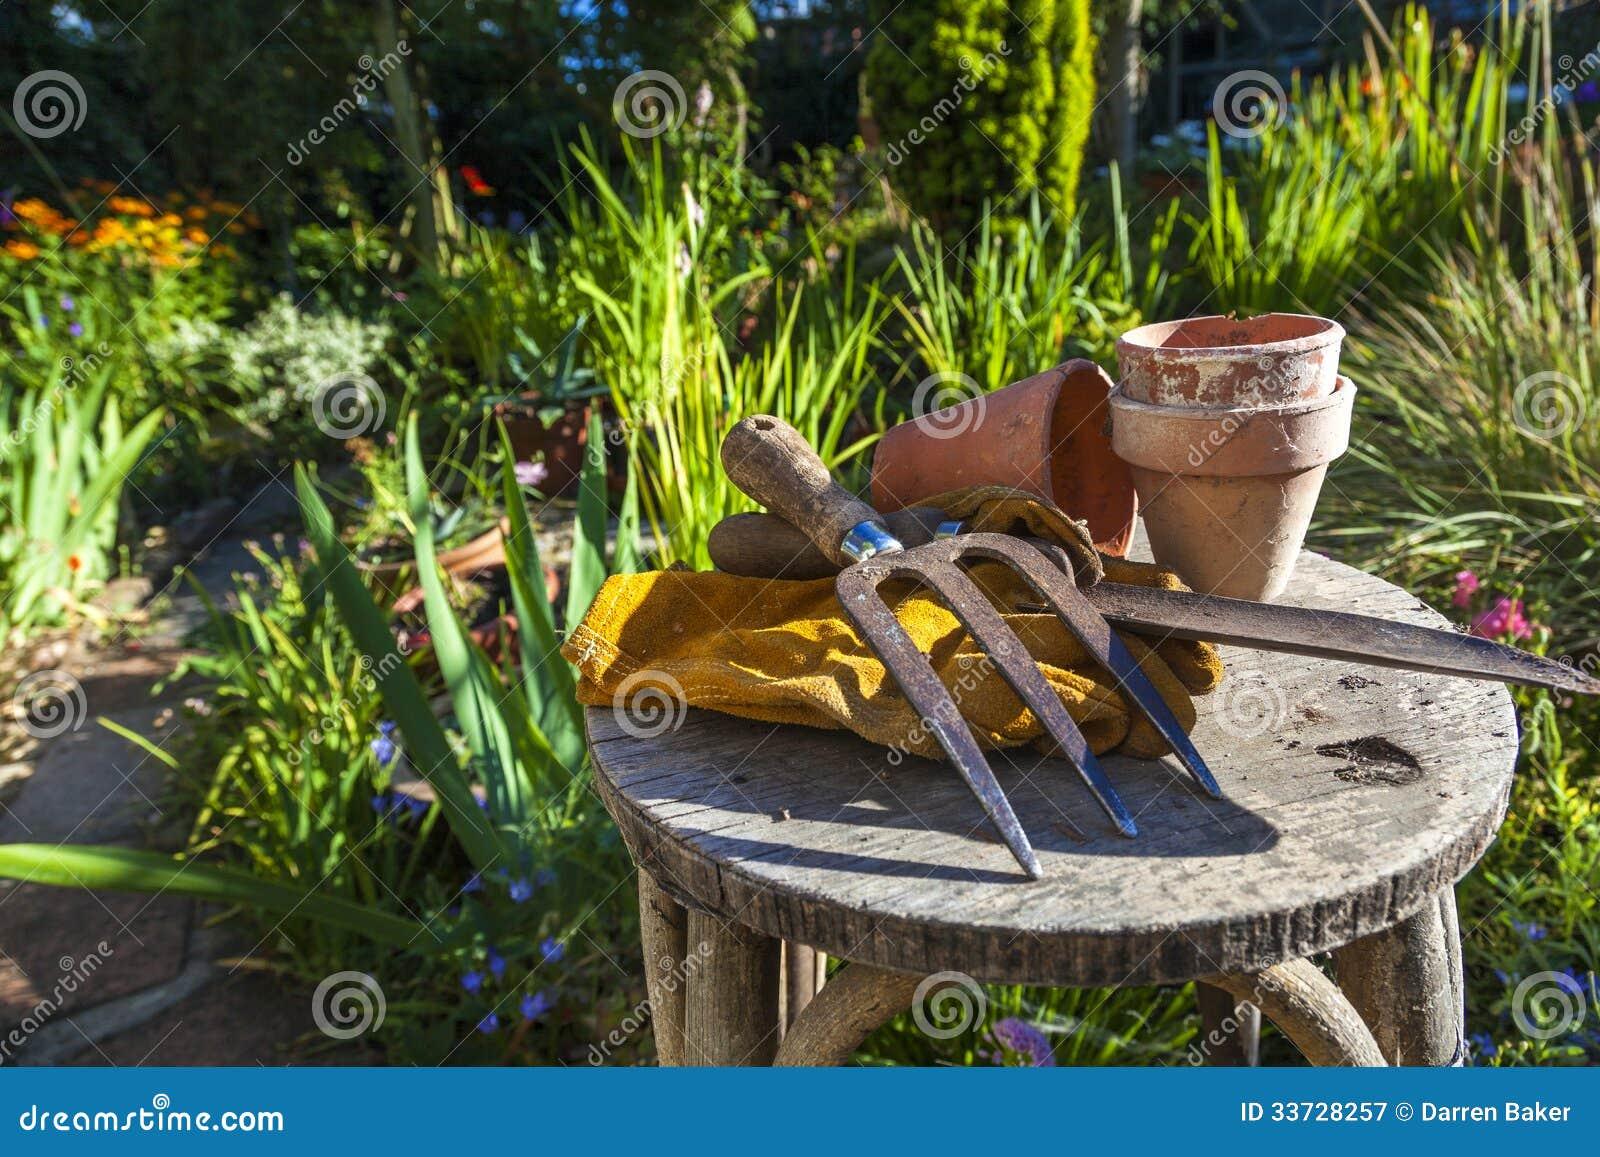 Gardening Royalty Free Stock Photography Image 33728257